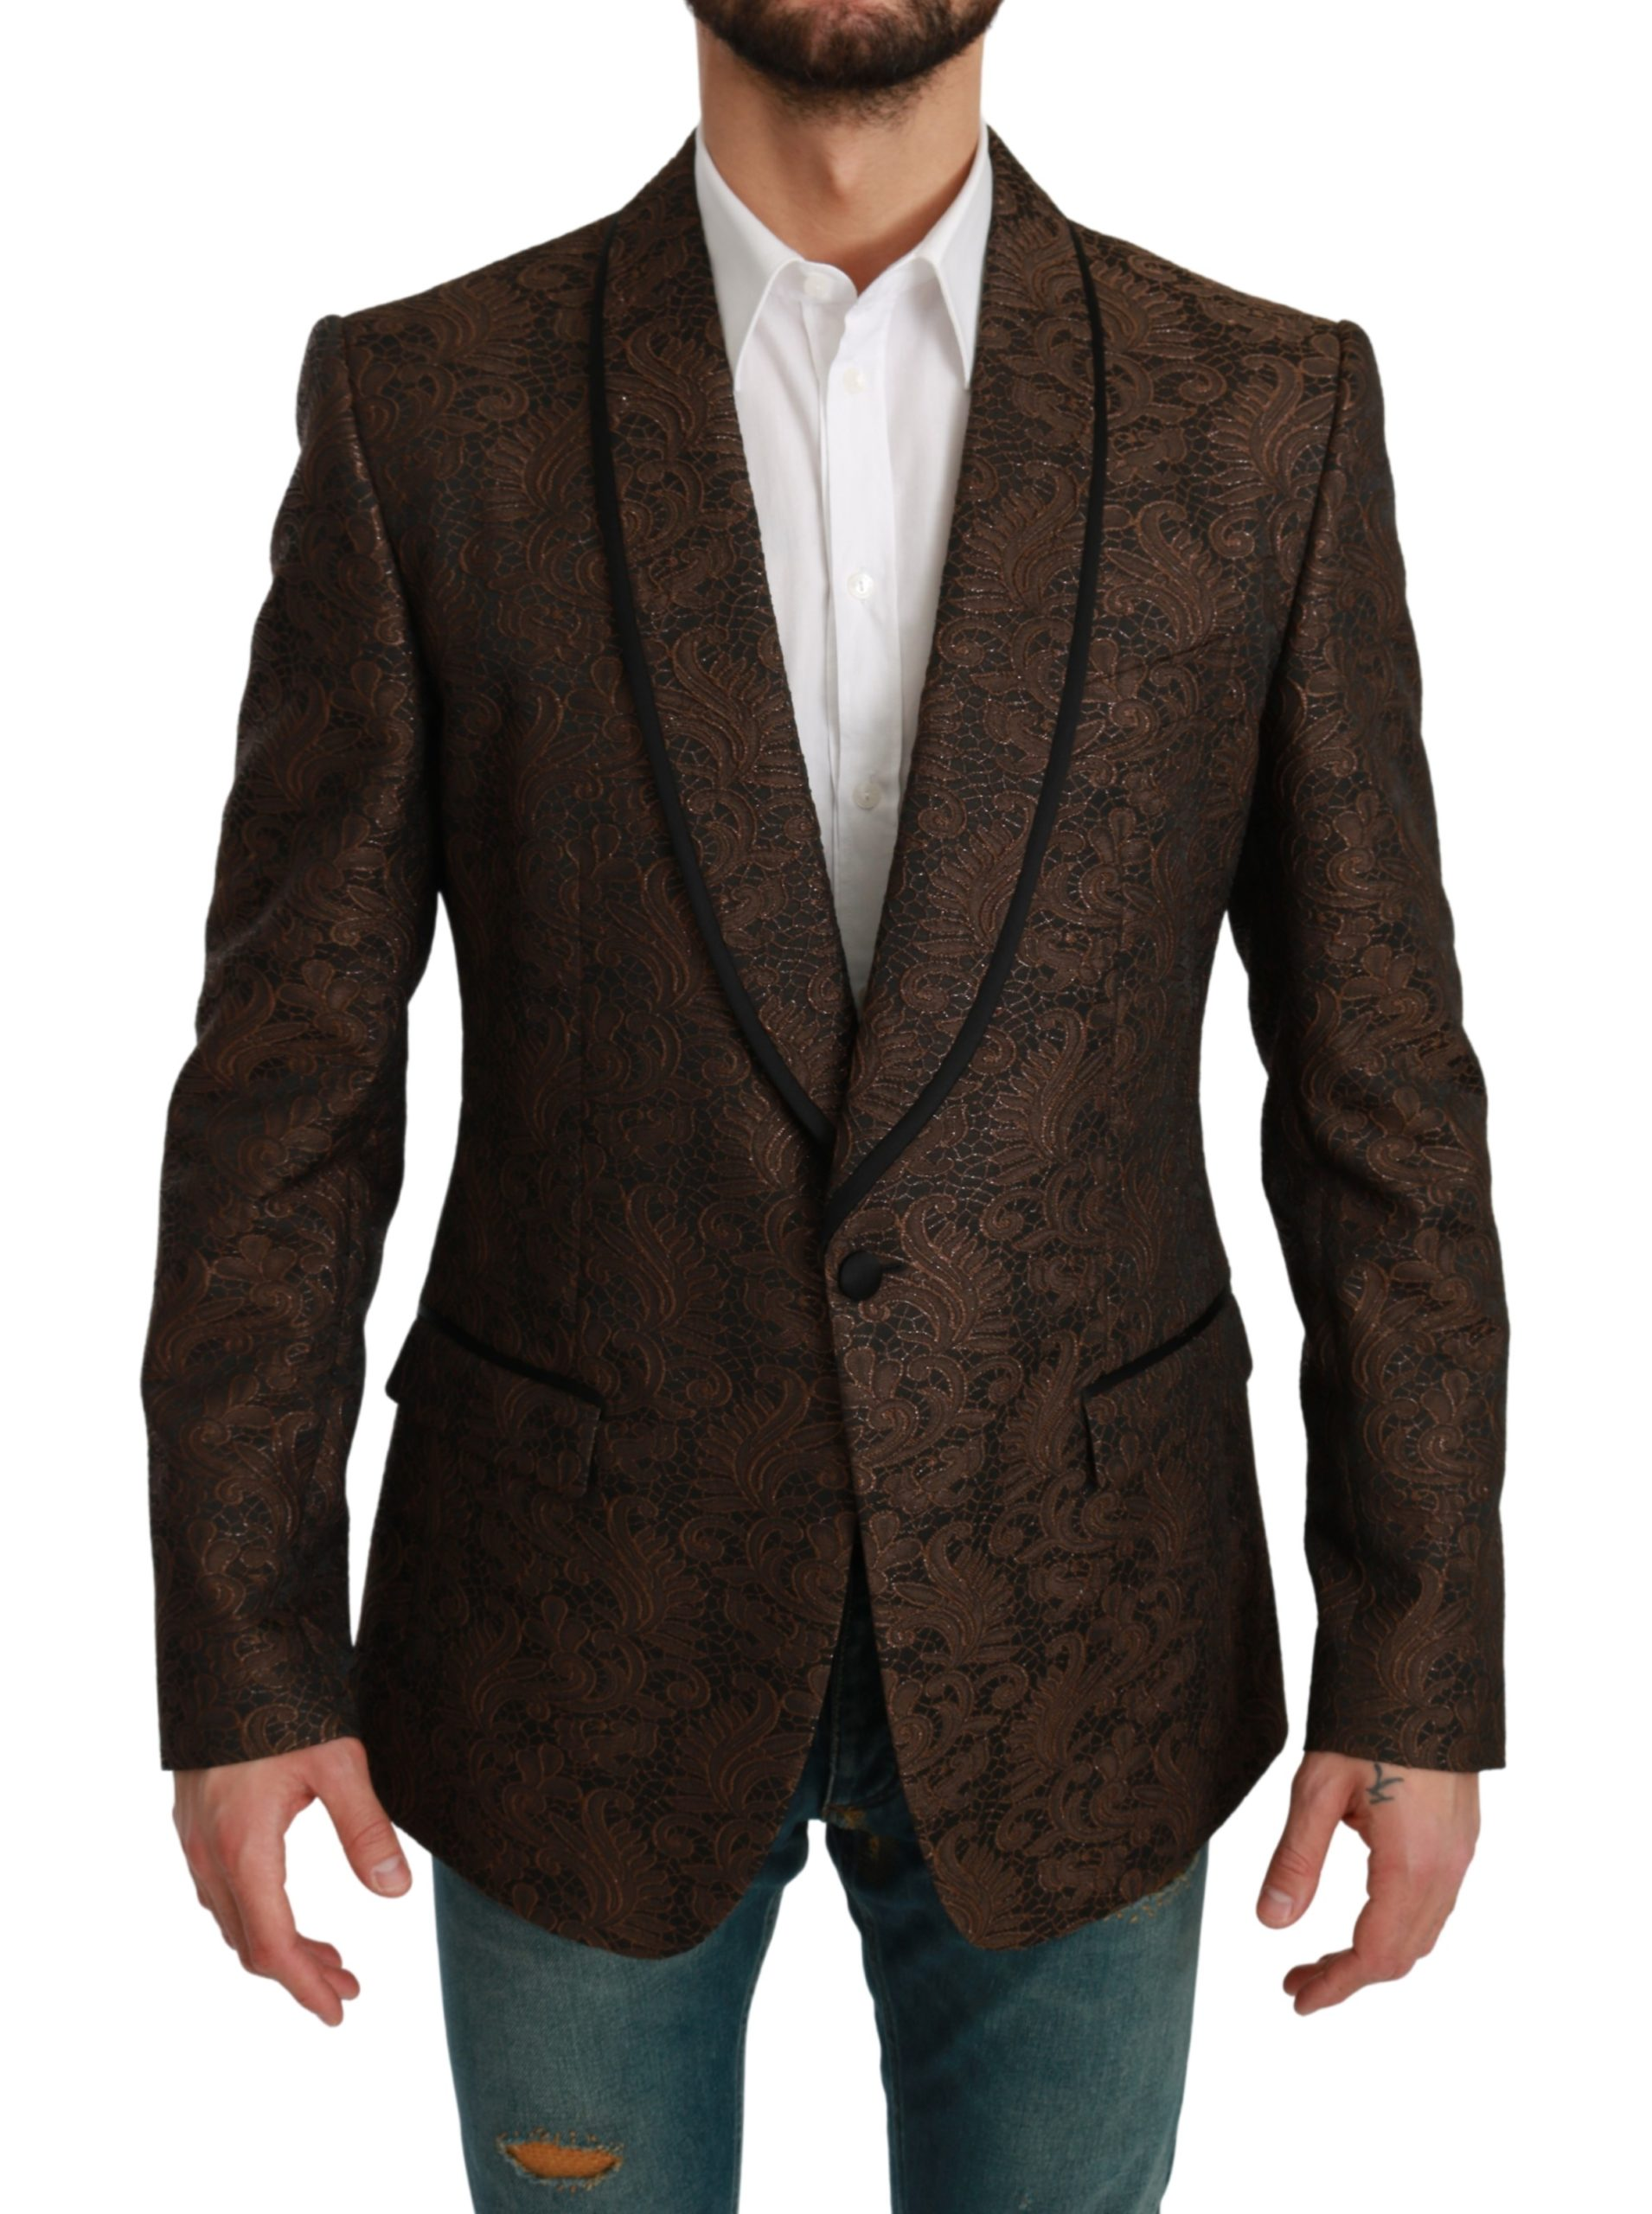 Dolce & Gabbana Men's Lace Slim Fit MARTINI Blazer Brown KOS1705 - IT52 | L